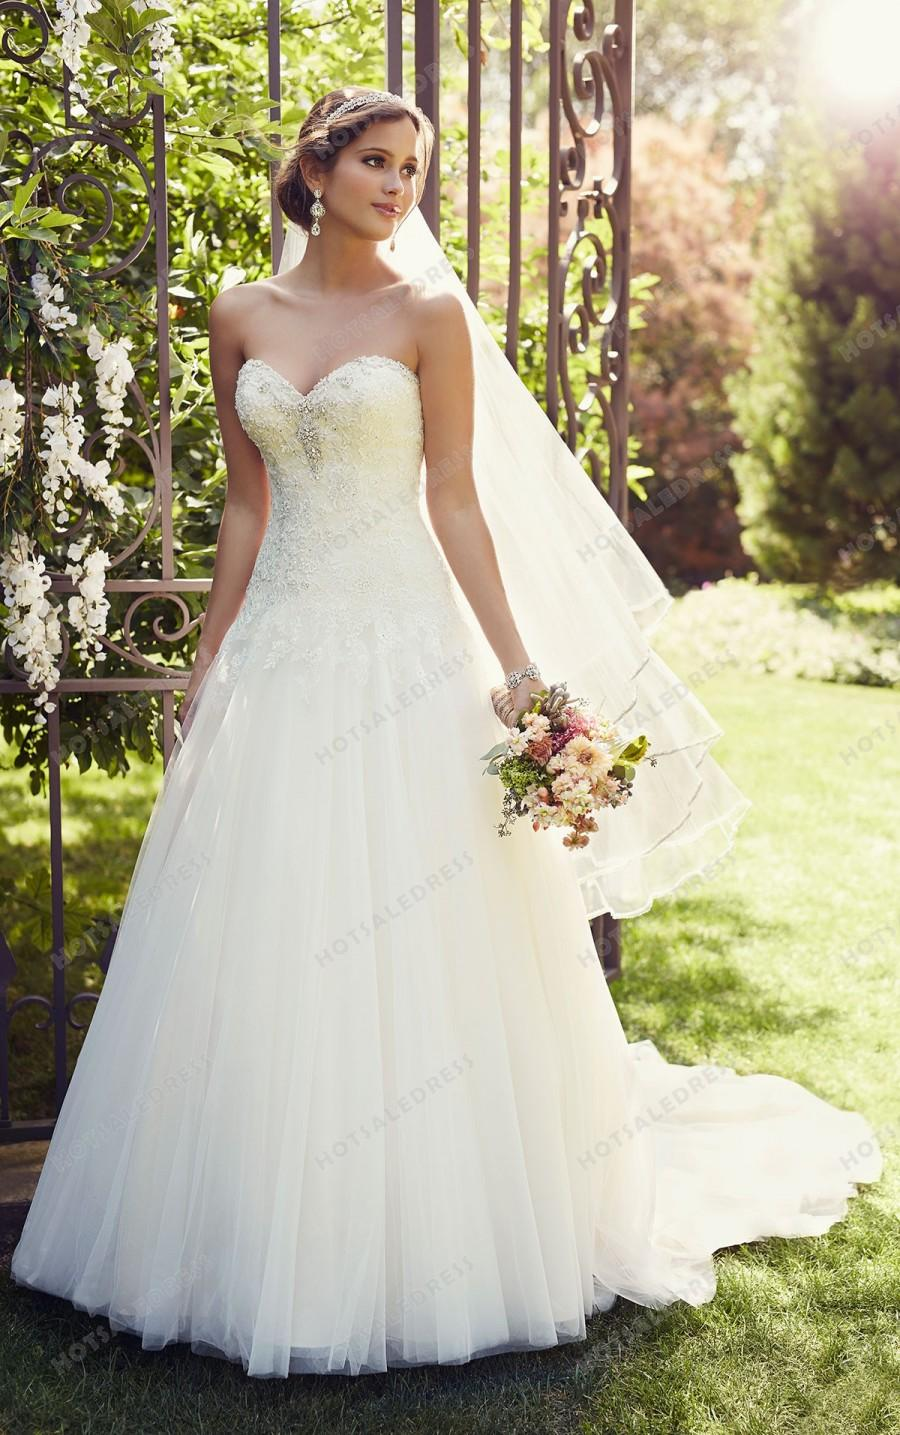 Essense of australia a line lace wedding dress style d1866 A line lace wedding dress australia